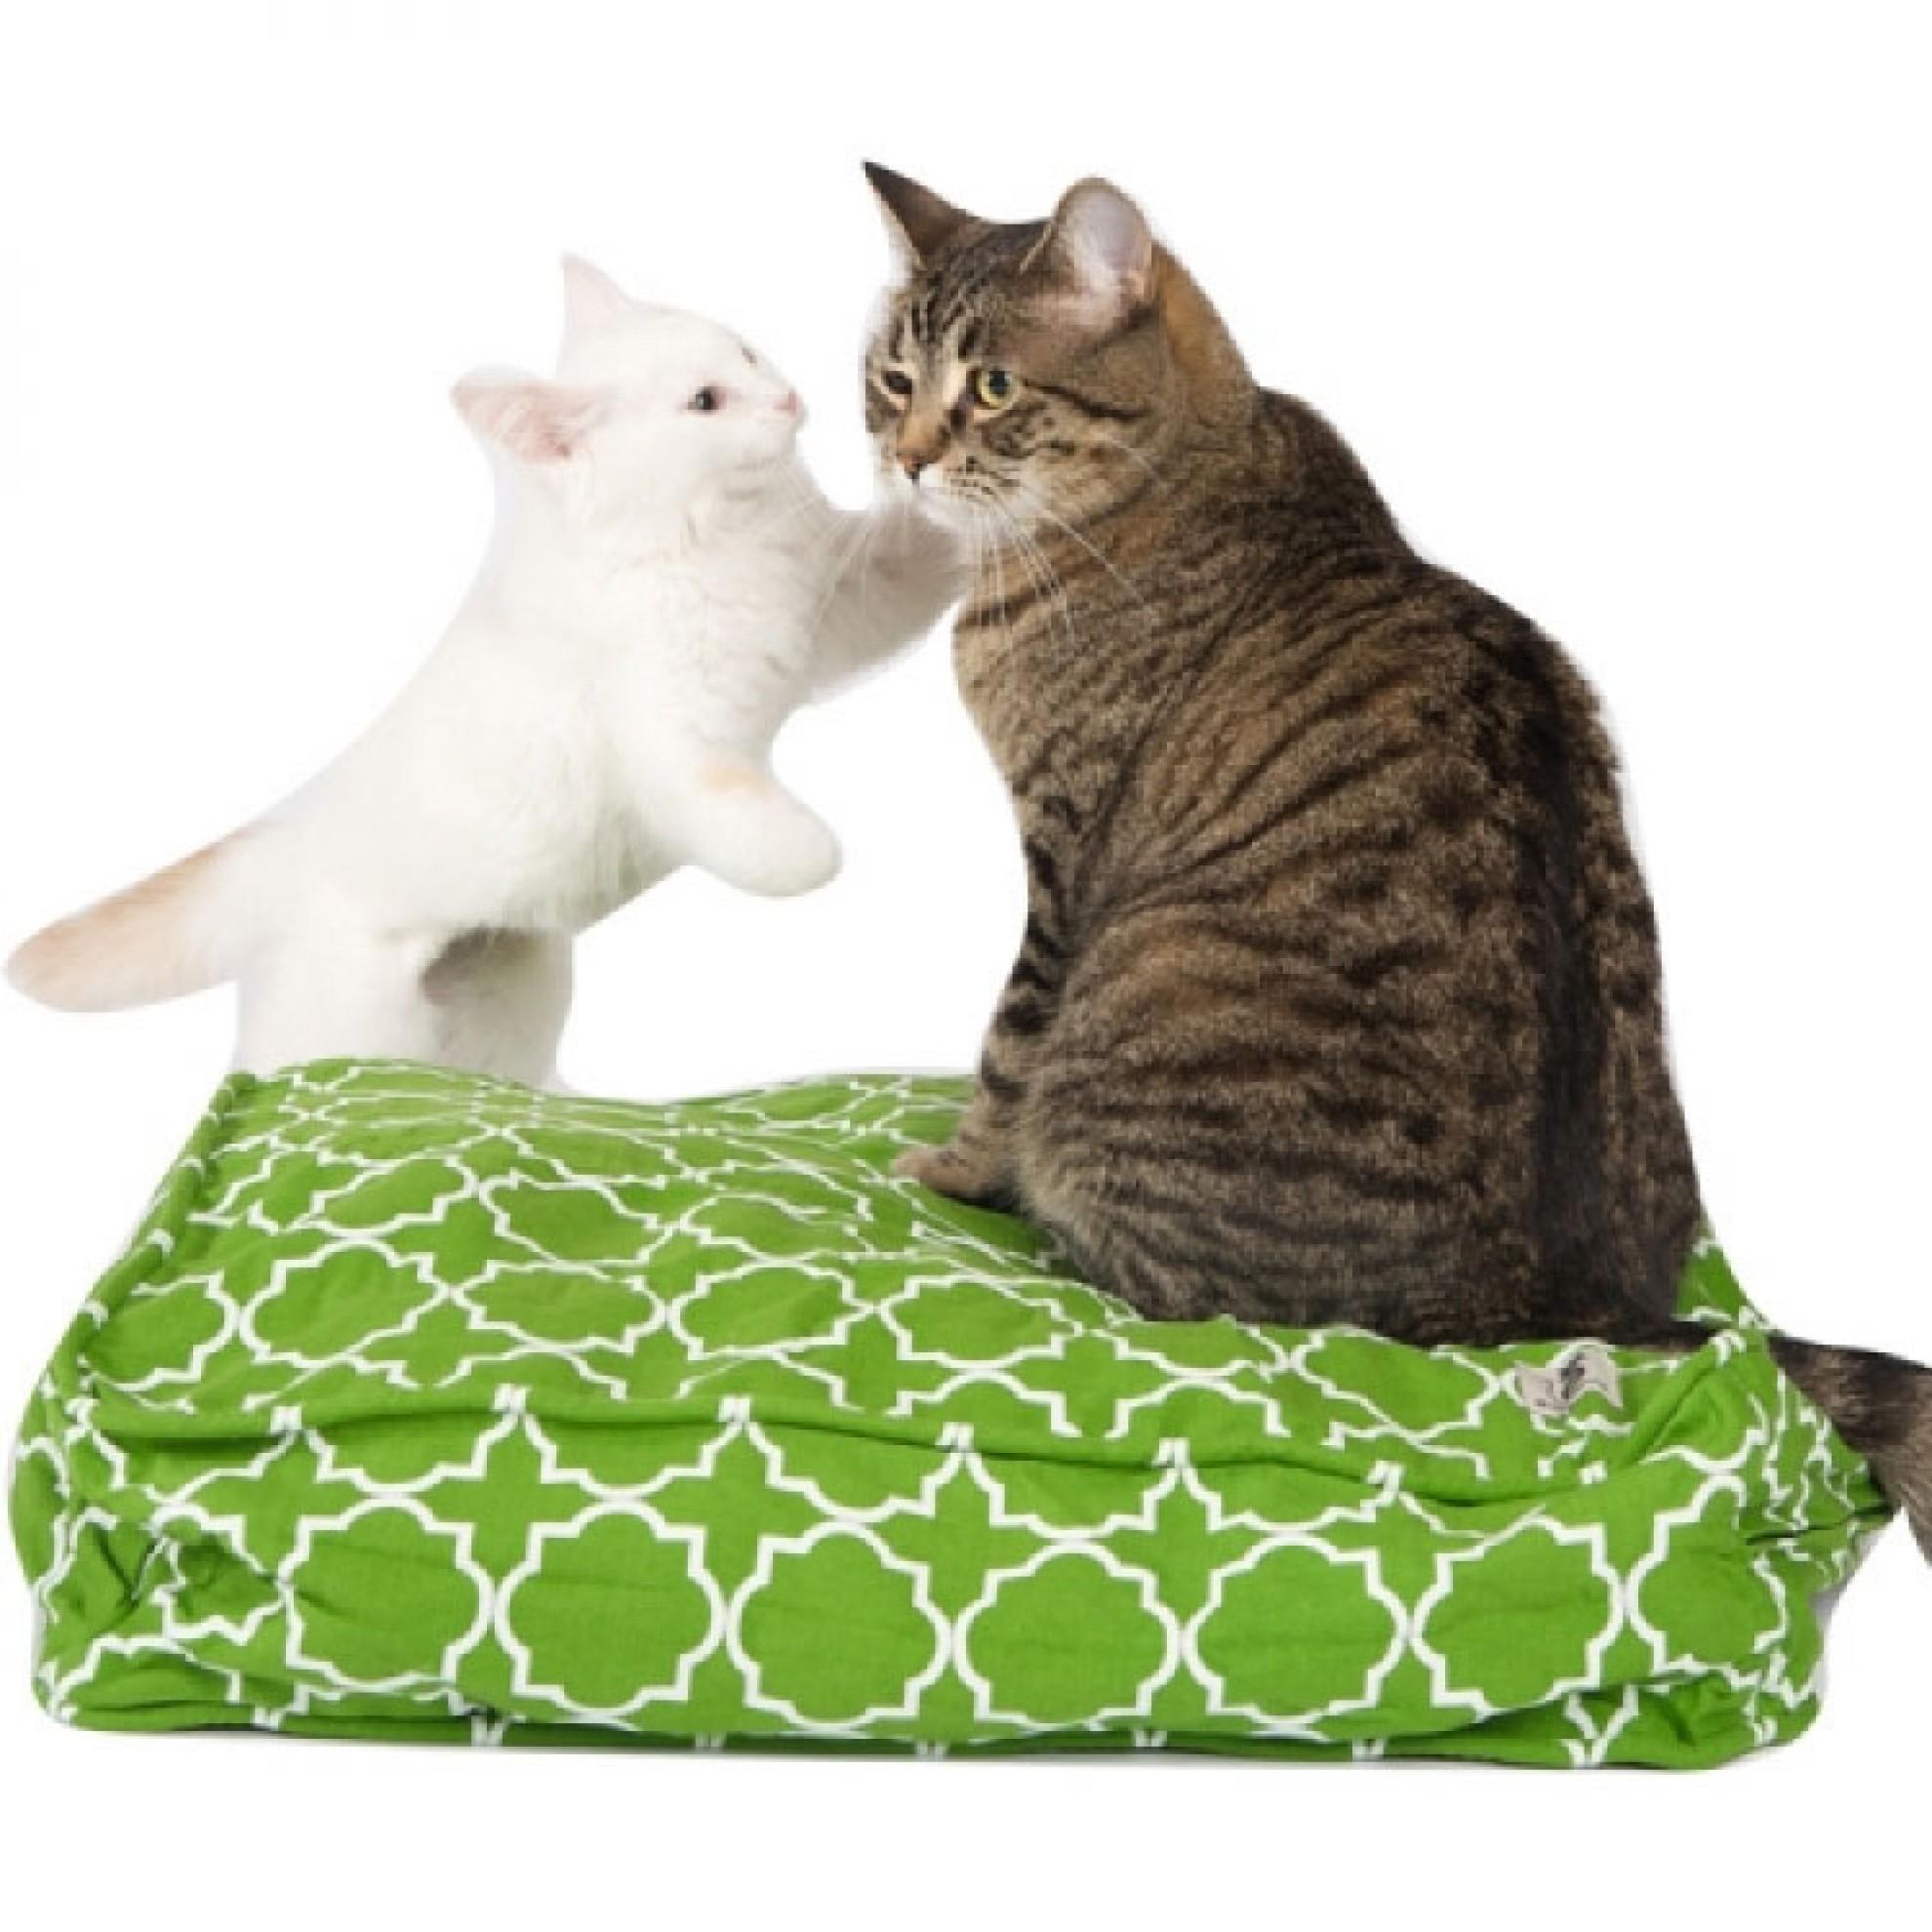 katzenkissen bezug zum selberf llen koh mak kissen f r katzen. Black Bedroom Furniture Sets. Home Design Ideas